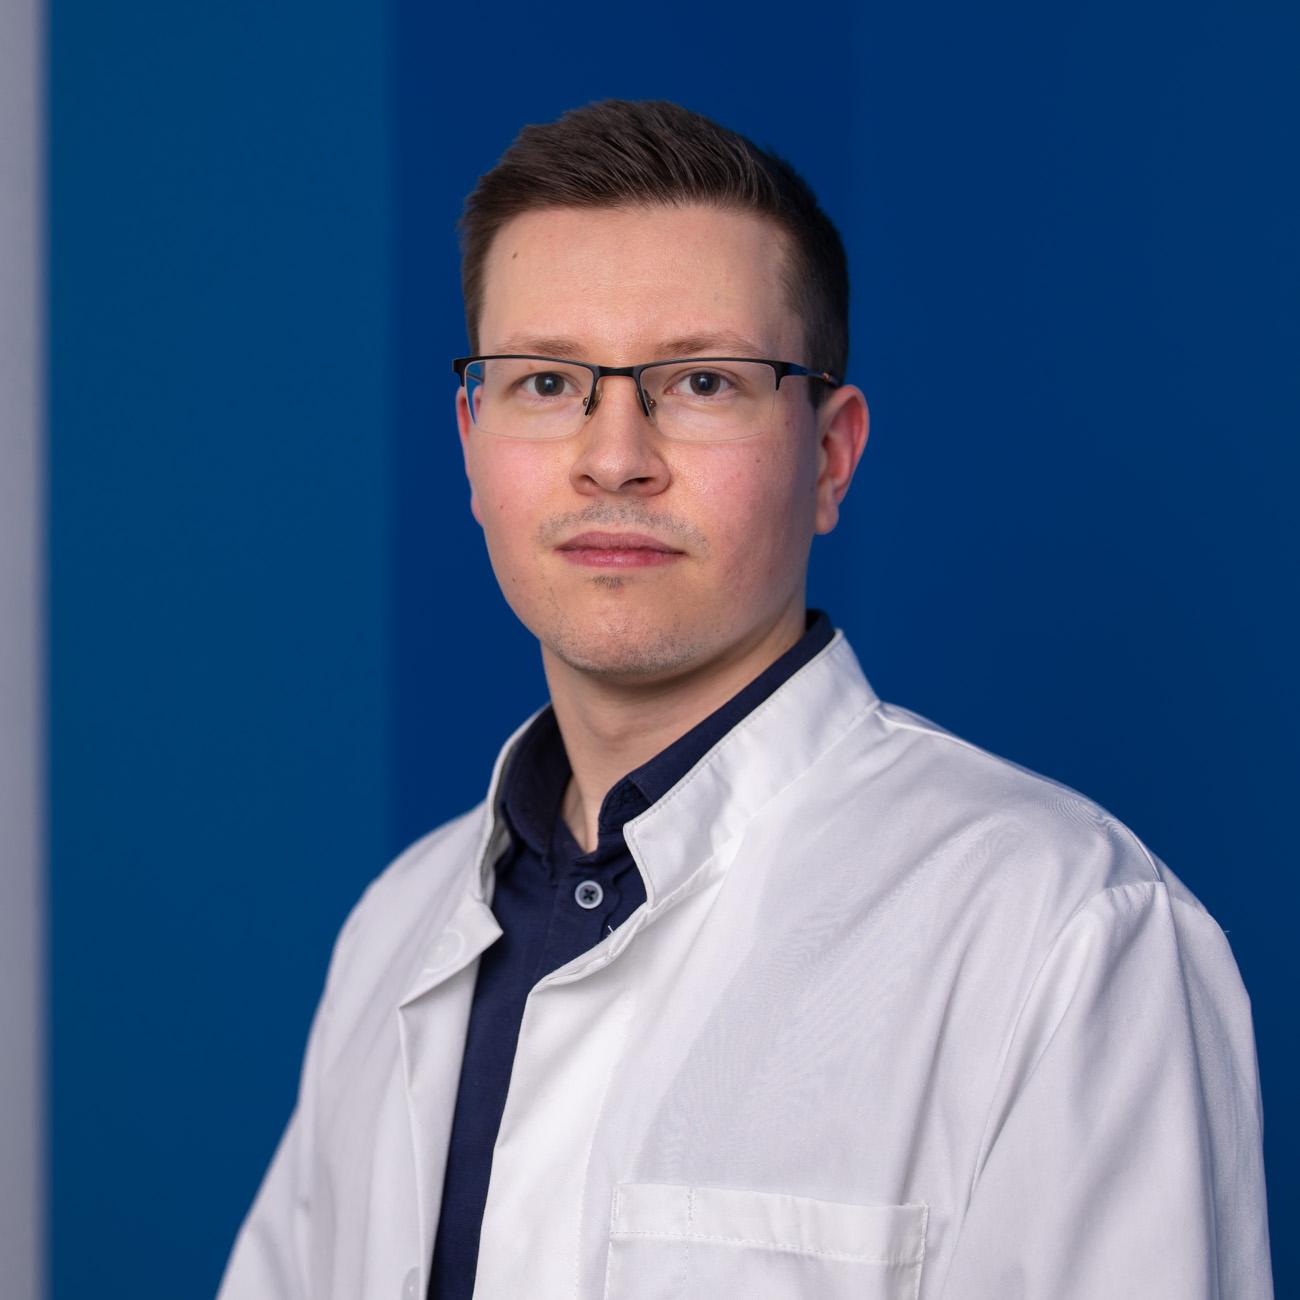 Henrik Salminen